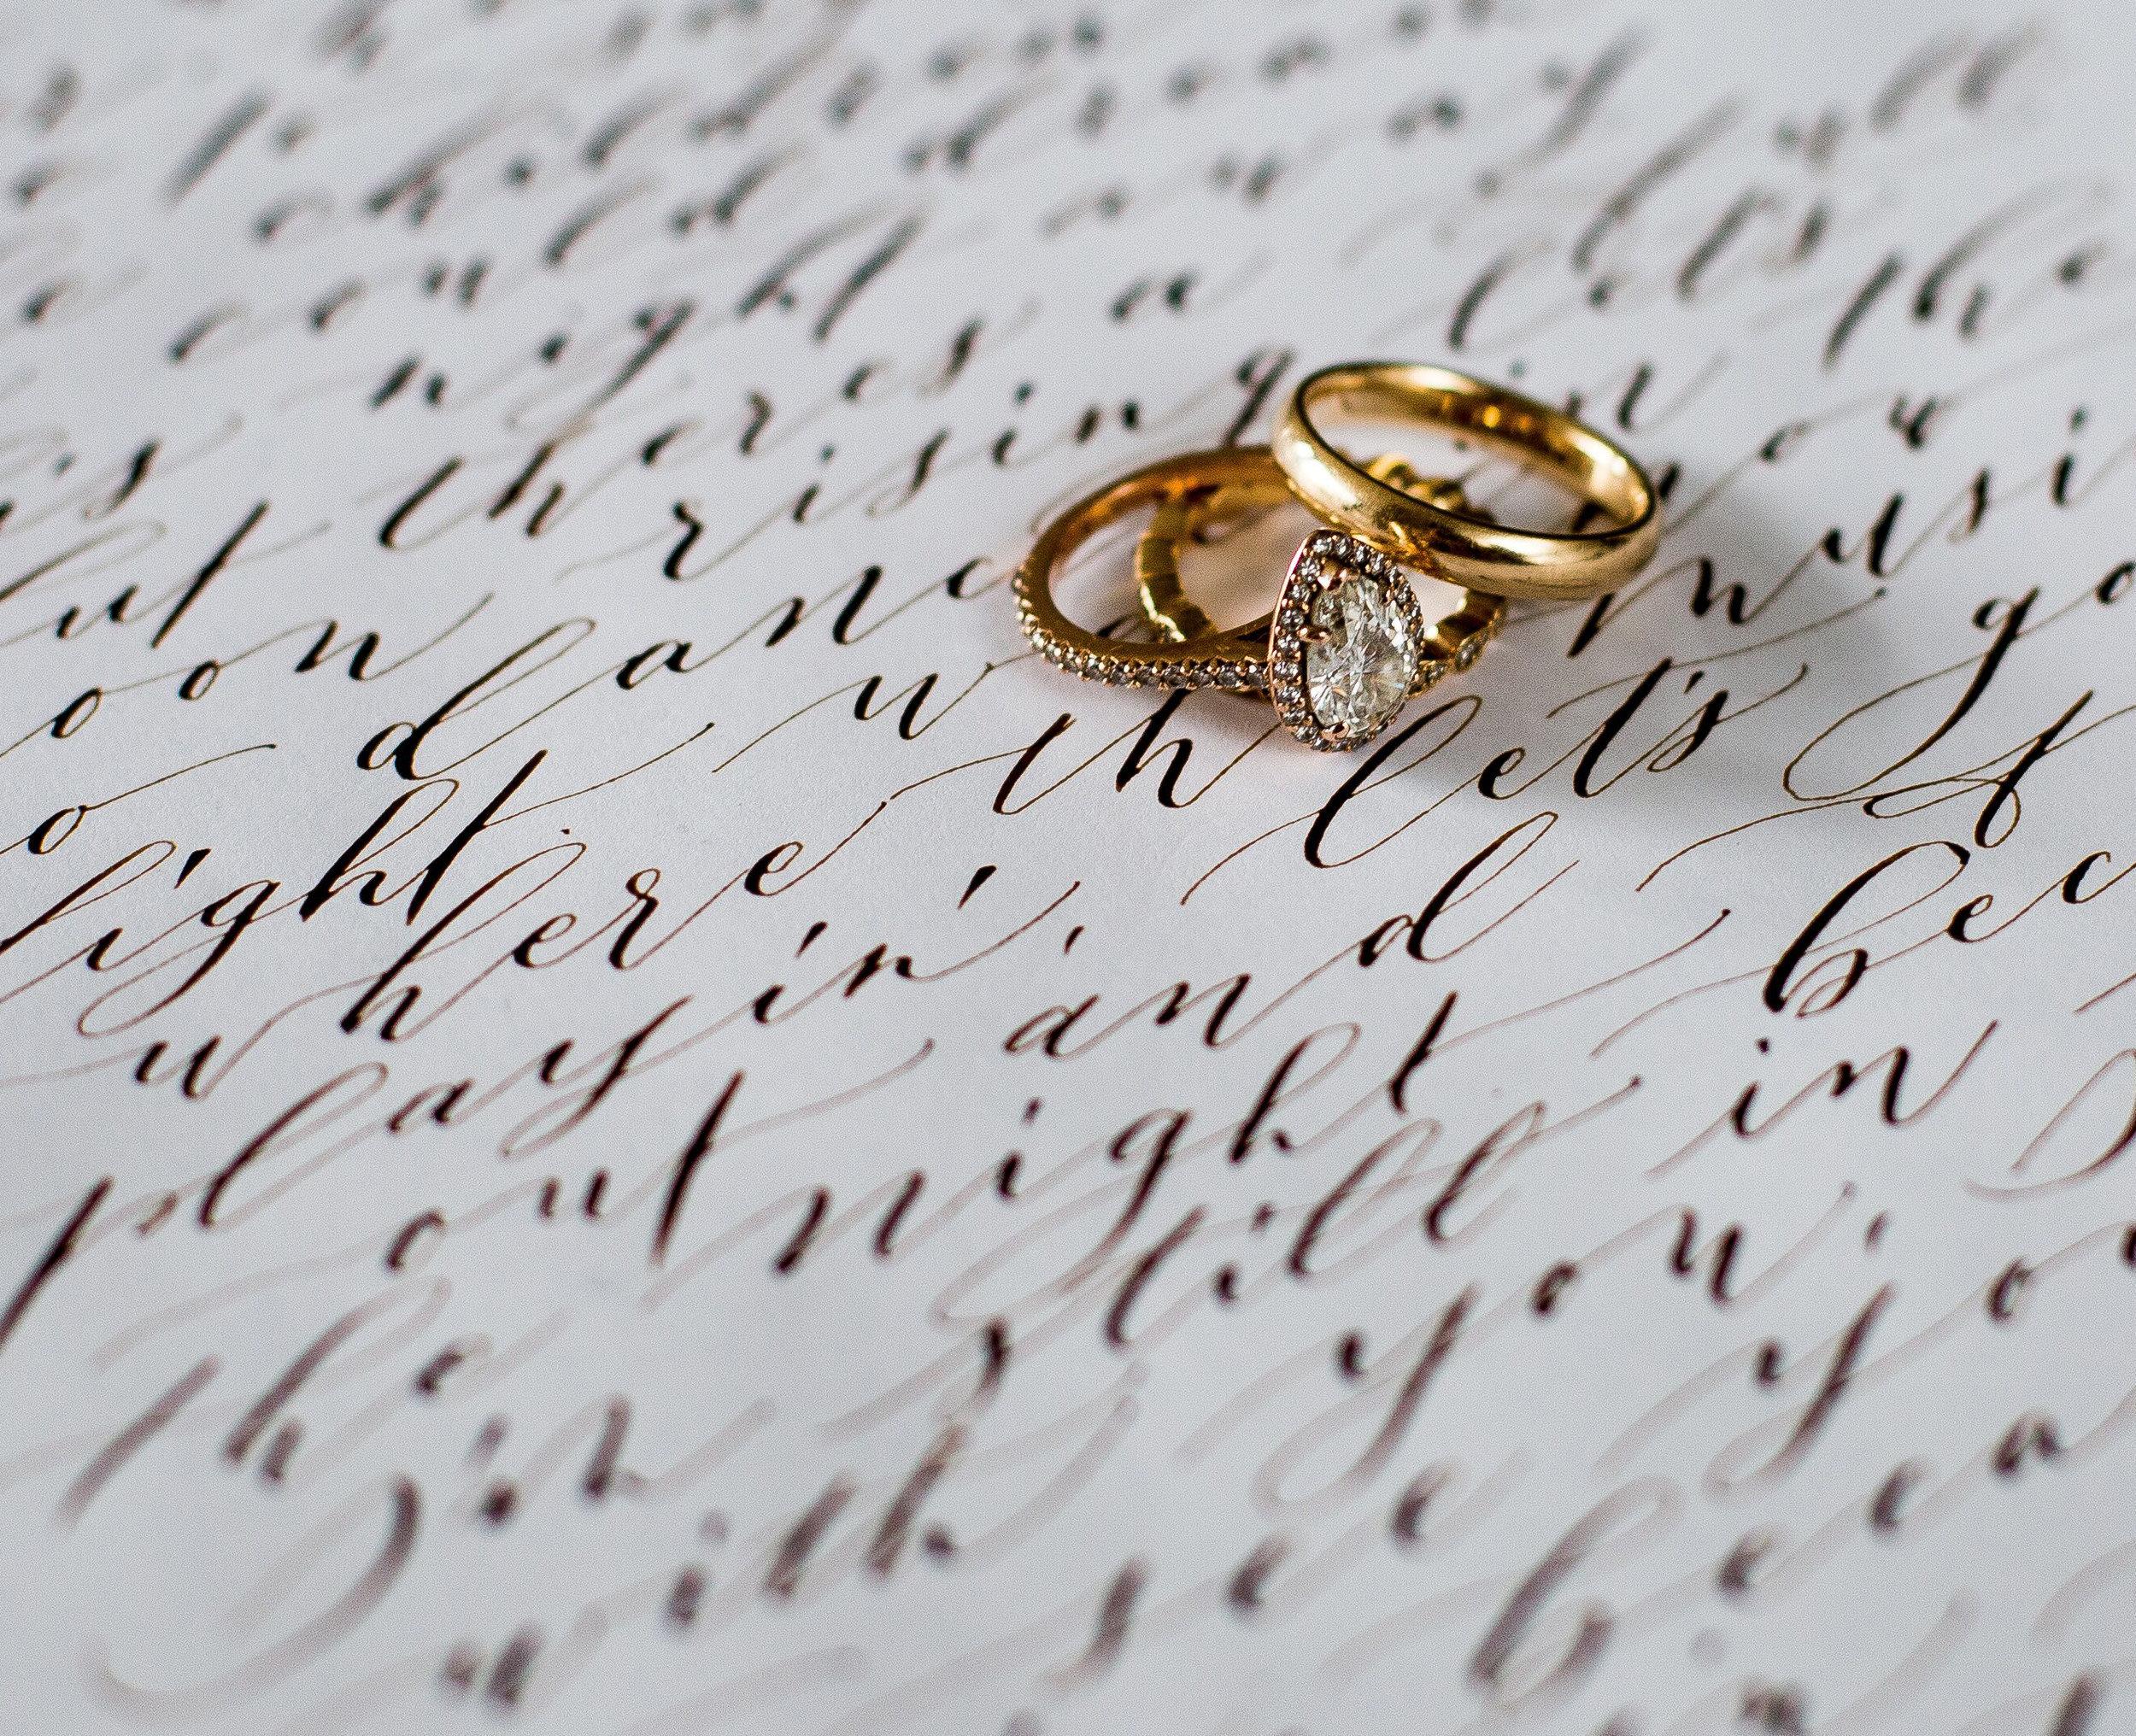 vows_calligraphy copy.jpg